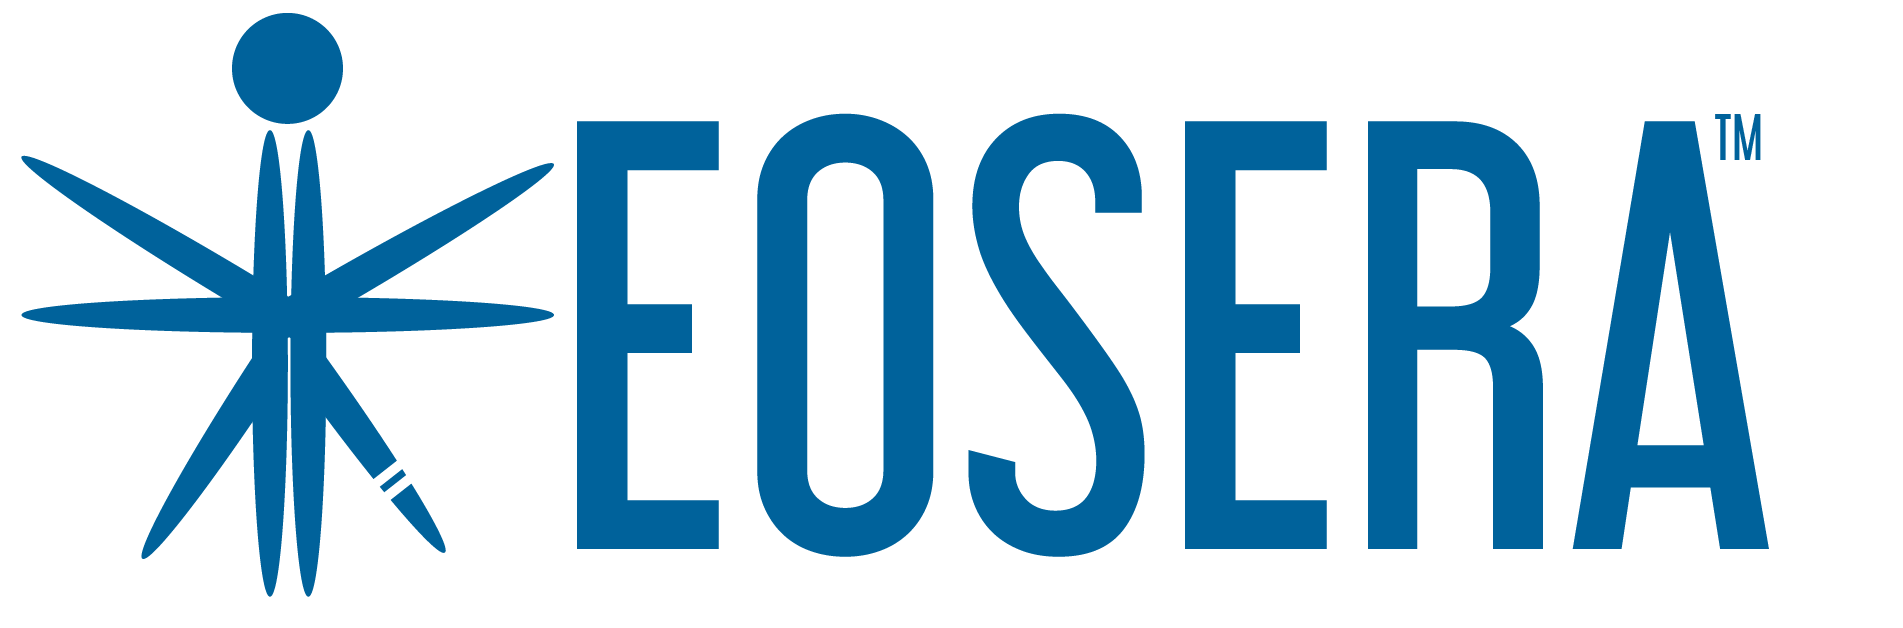 eosera.png